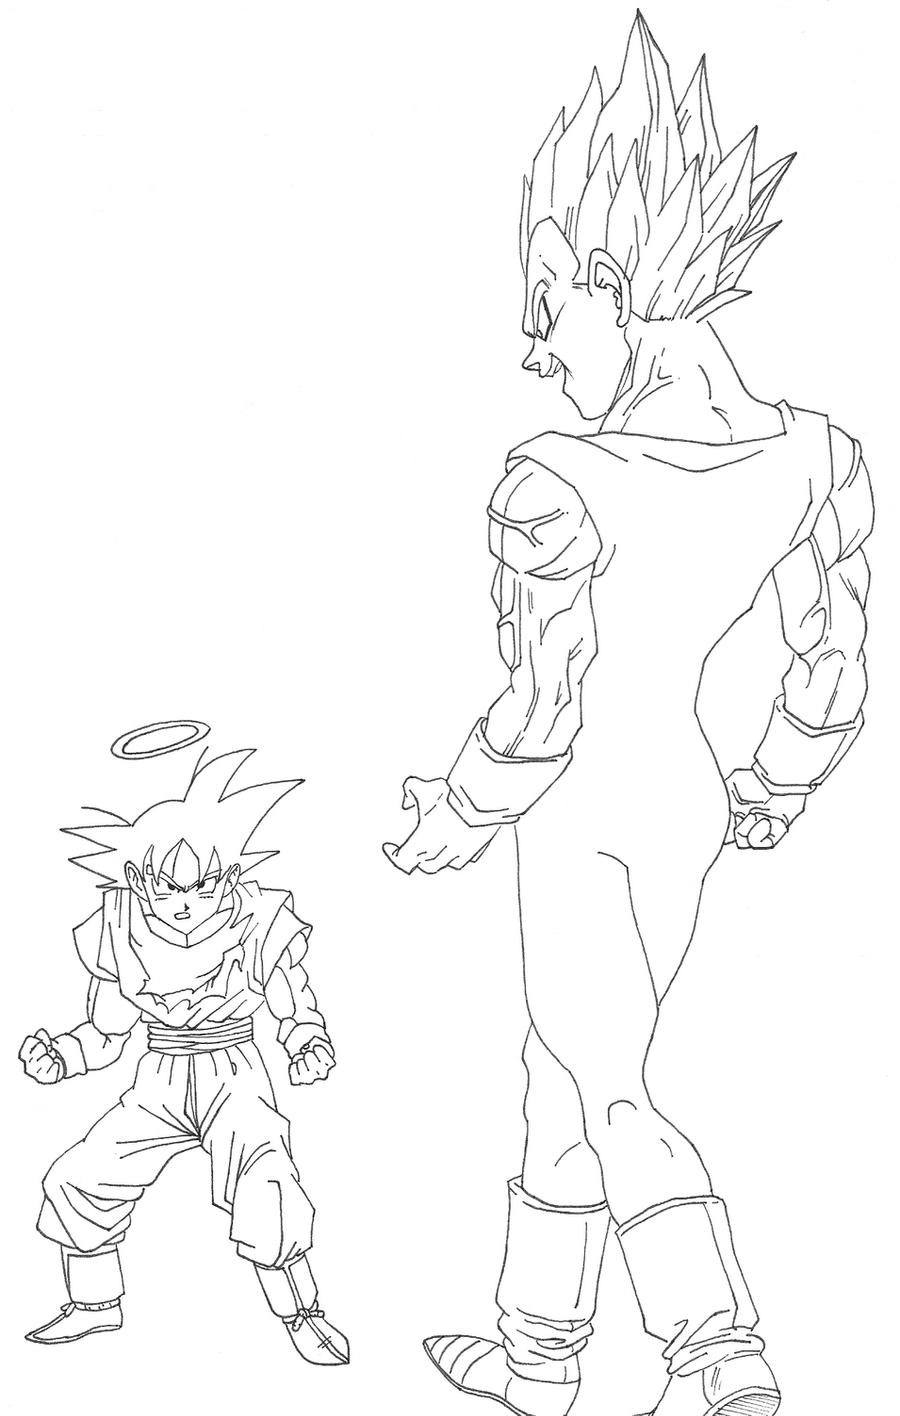 Majin vegeta vs goku by osoroshiiyasai on deviantart for Vegeta coloring page